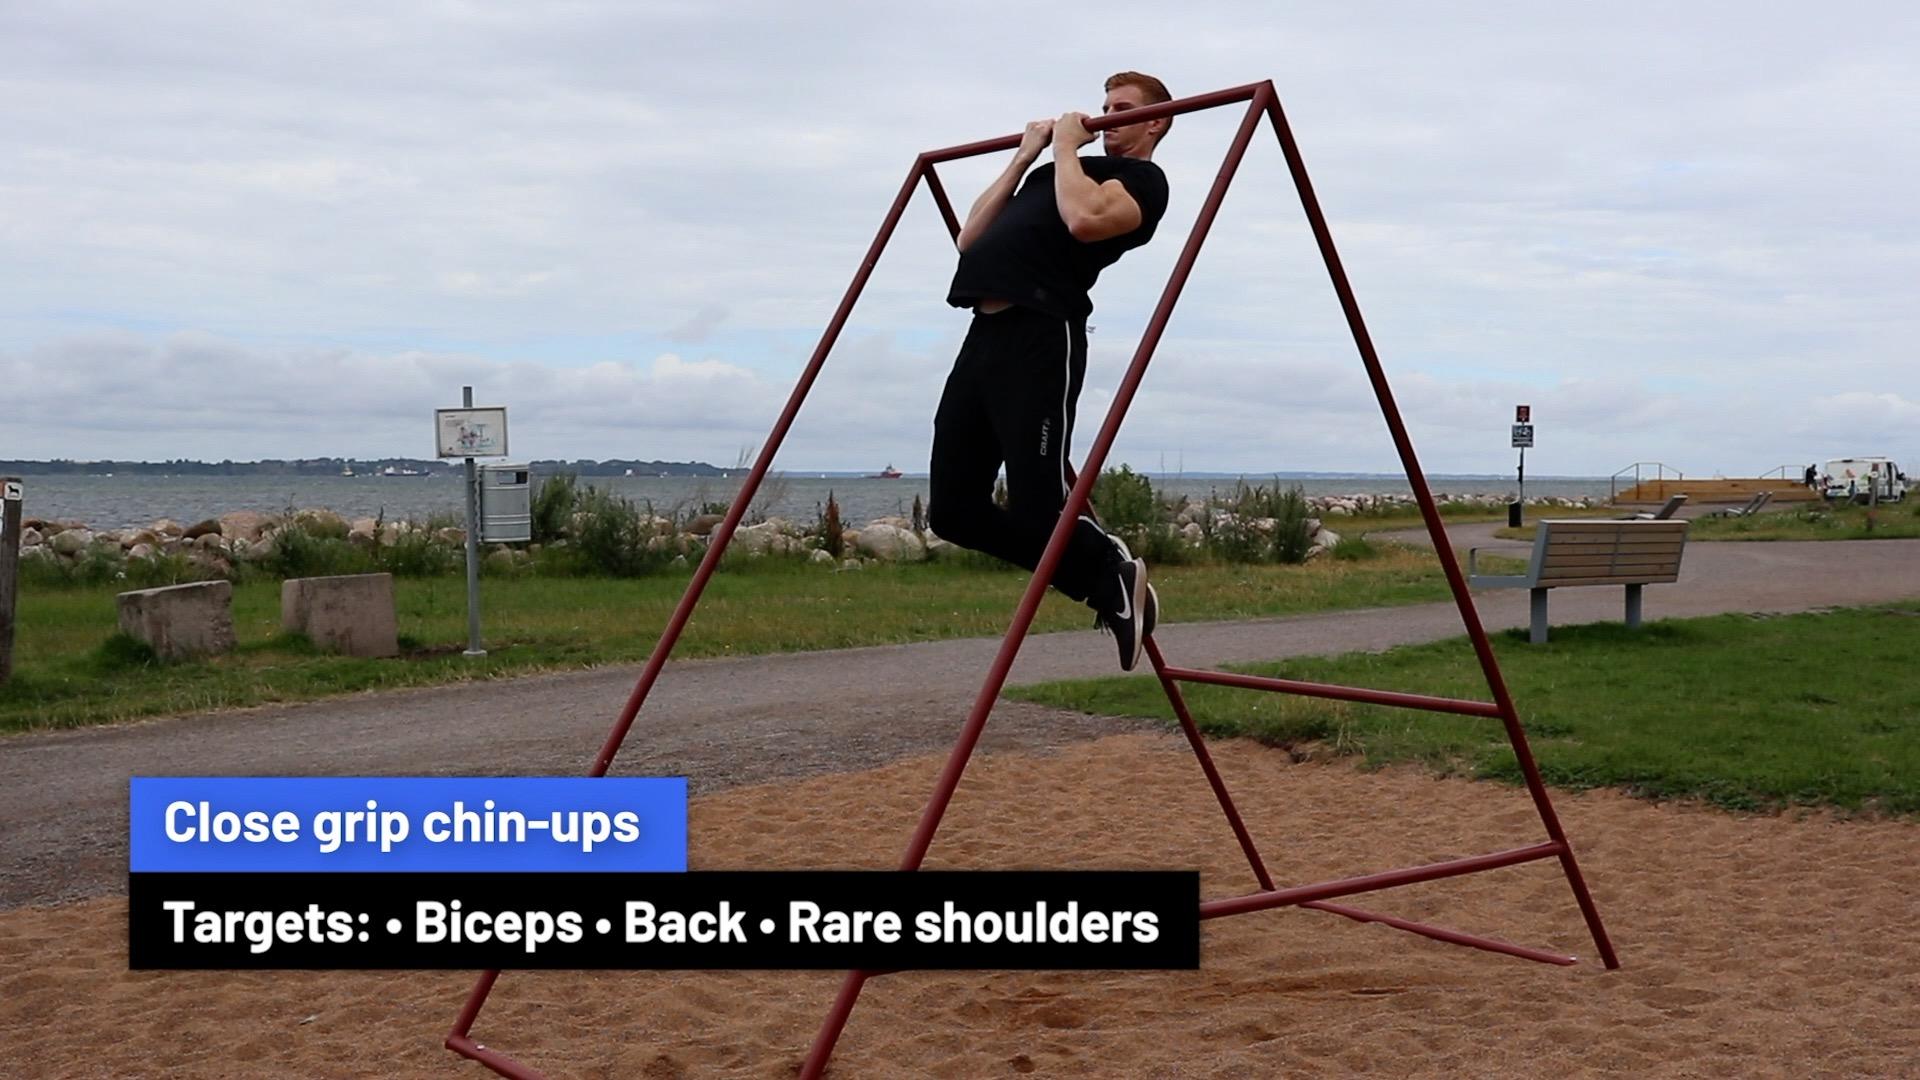 Close grip chin-ups